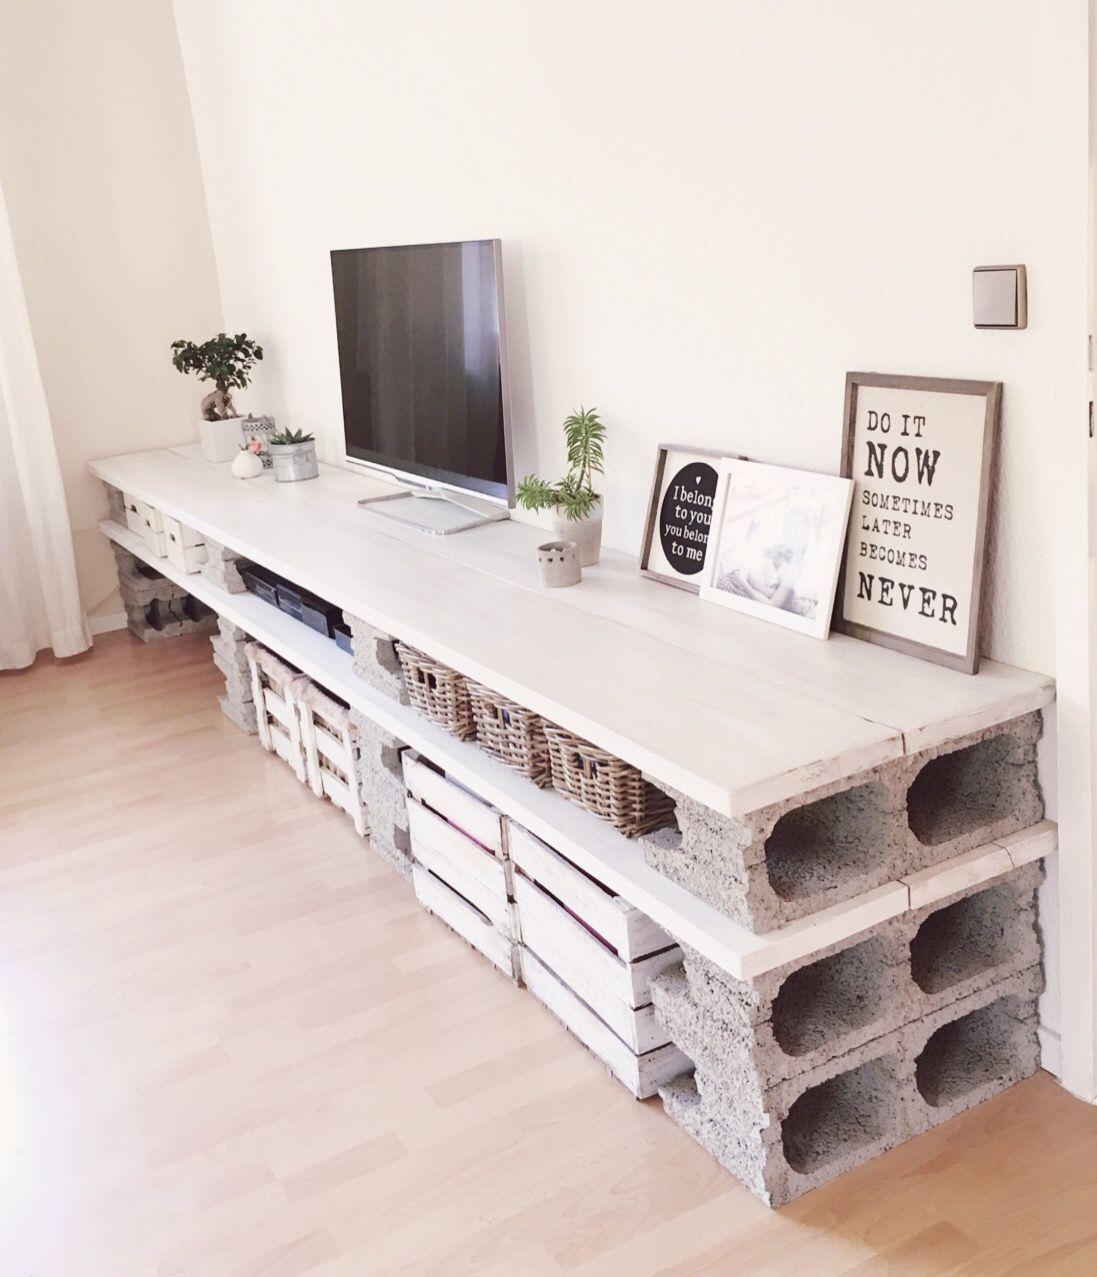 Fast fertig | Pinterest | Tv lowboard, Lowboard und Diy tv